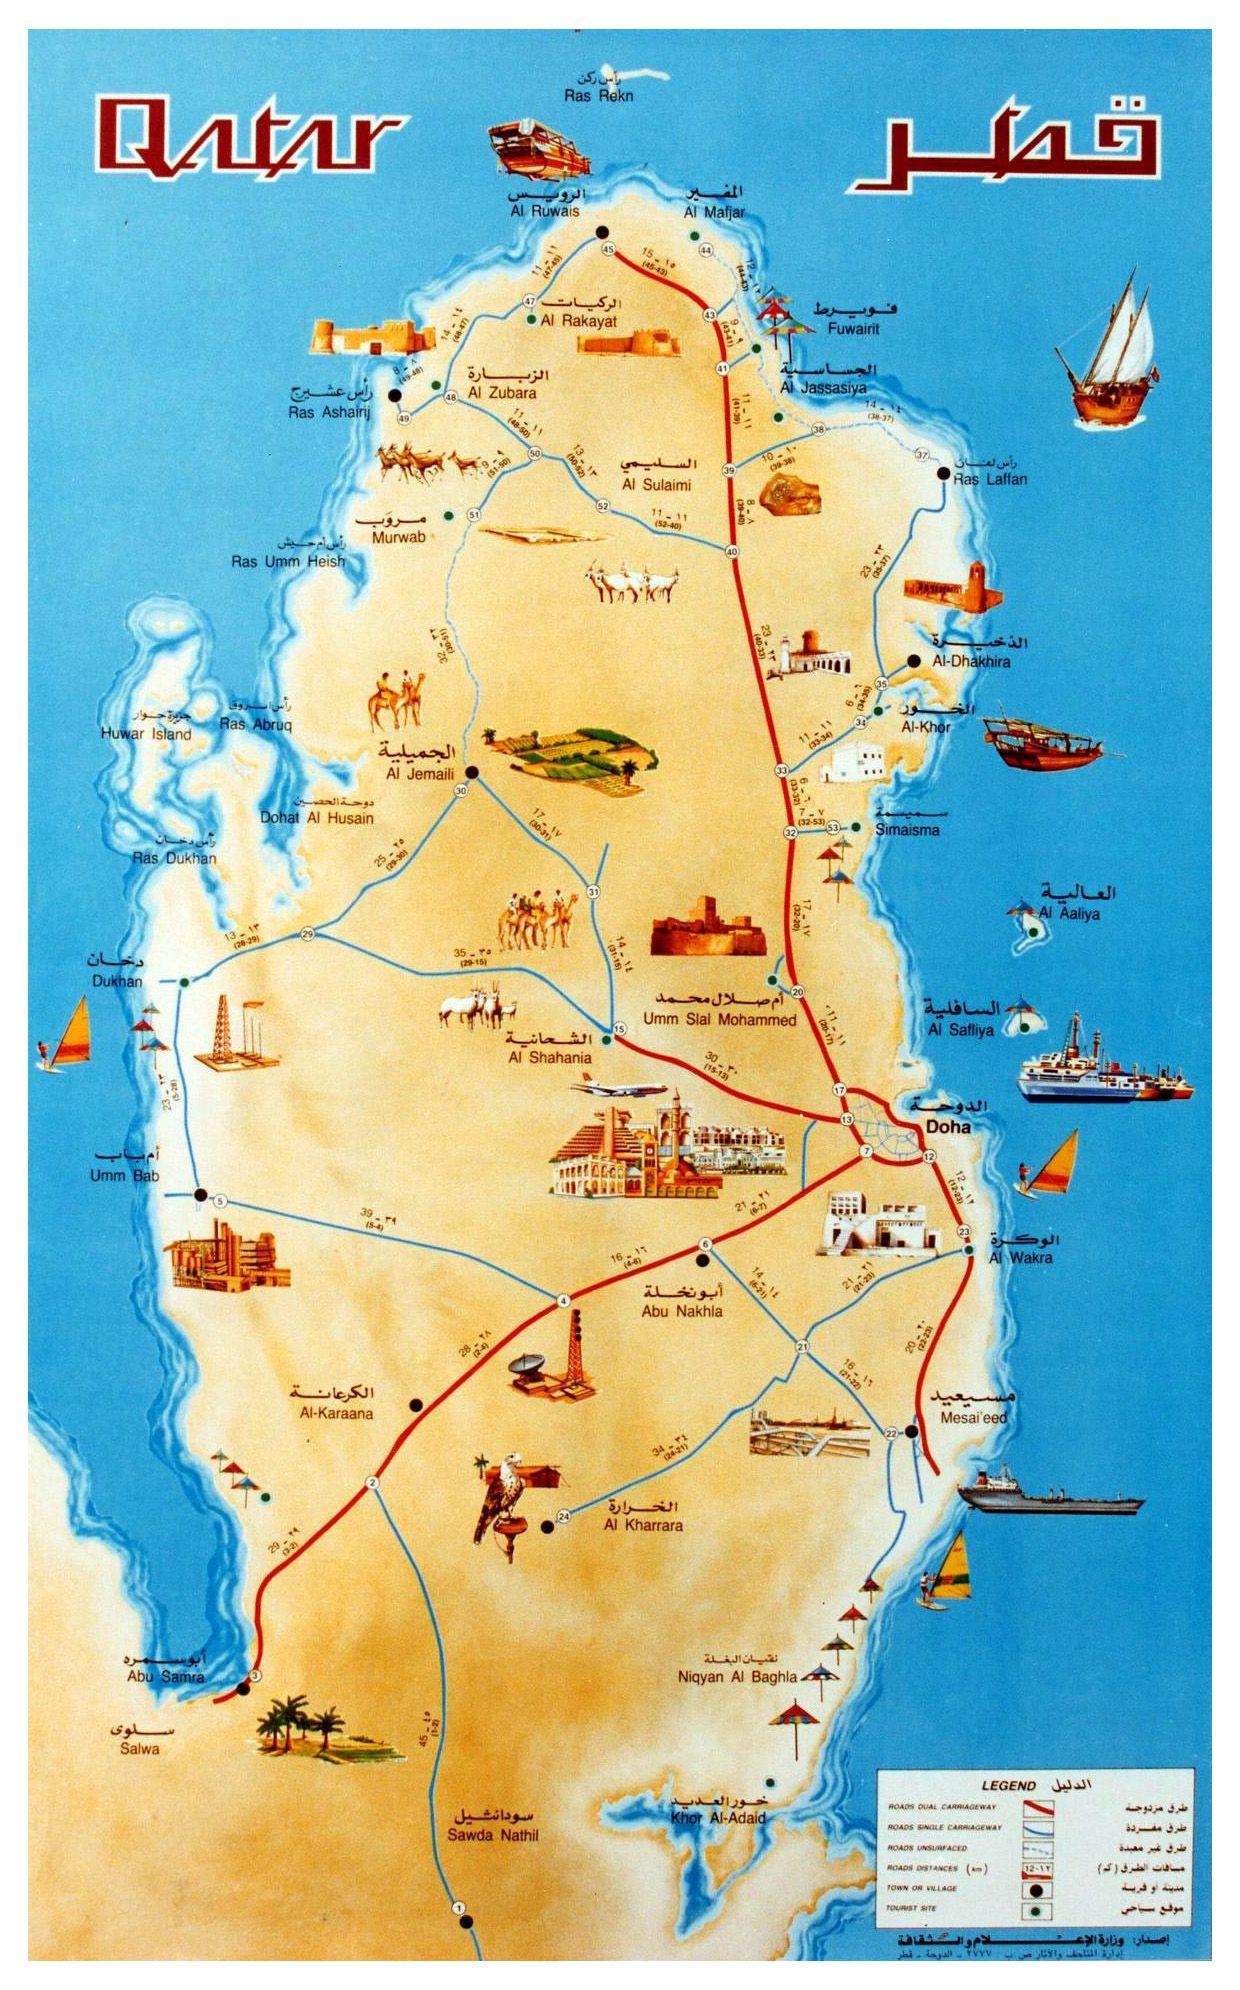 Tourist Map of Qatar